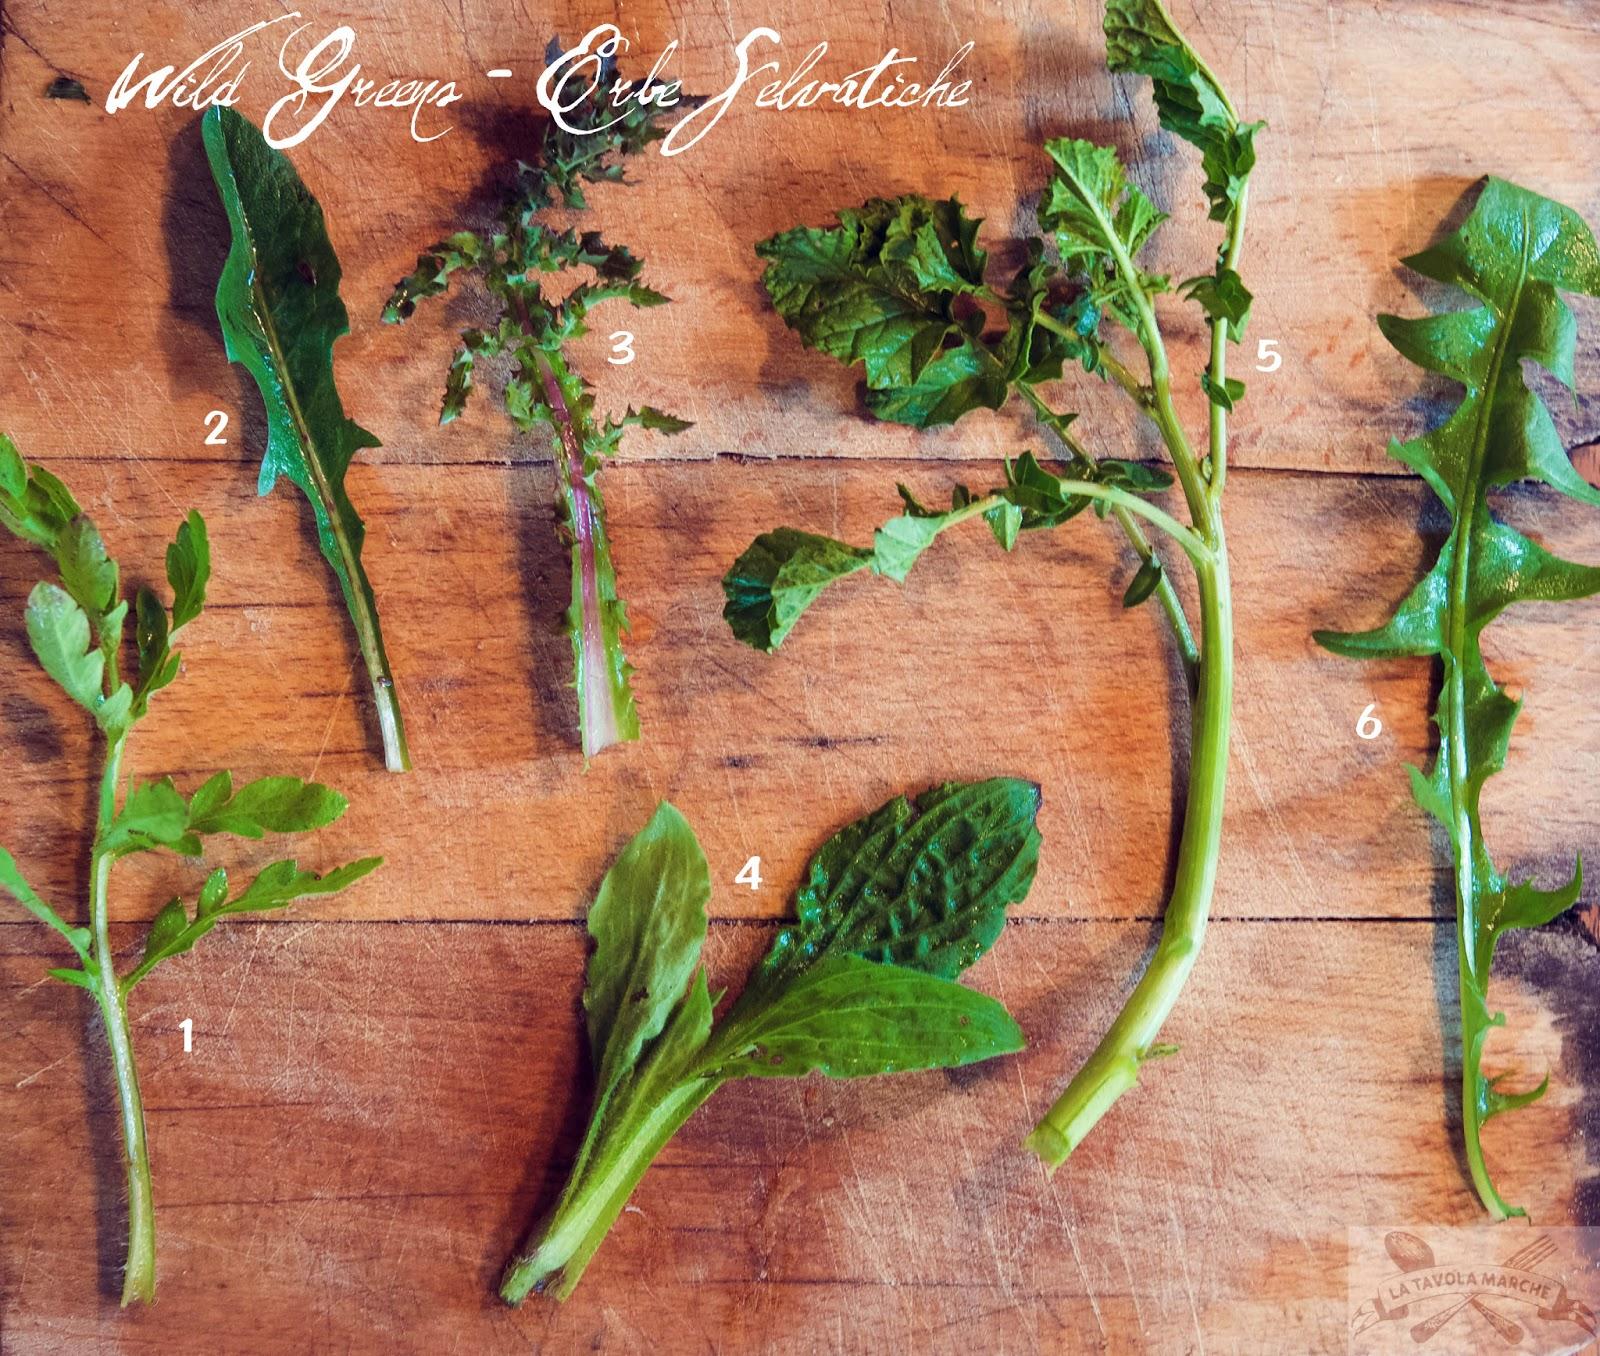 La Tavola Marche: Identifying & Eating Wild Greens